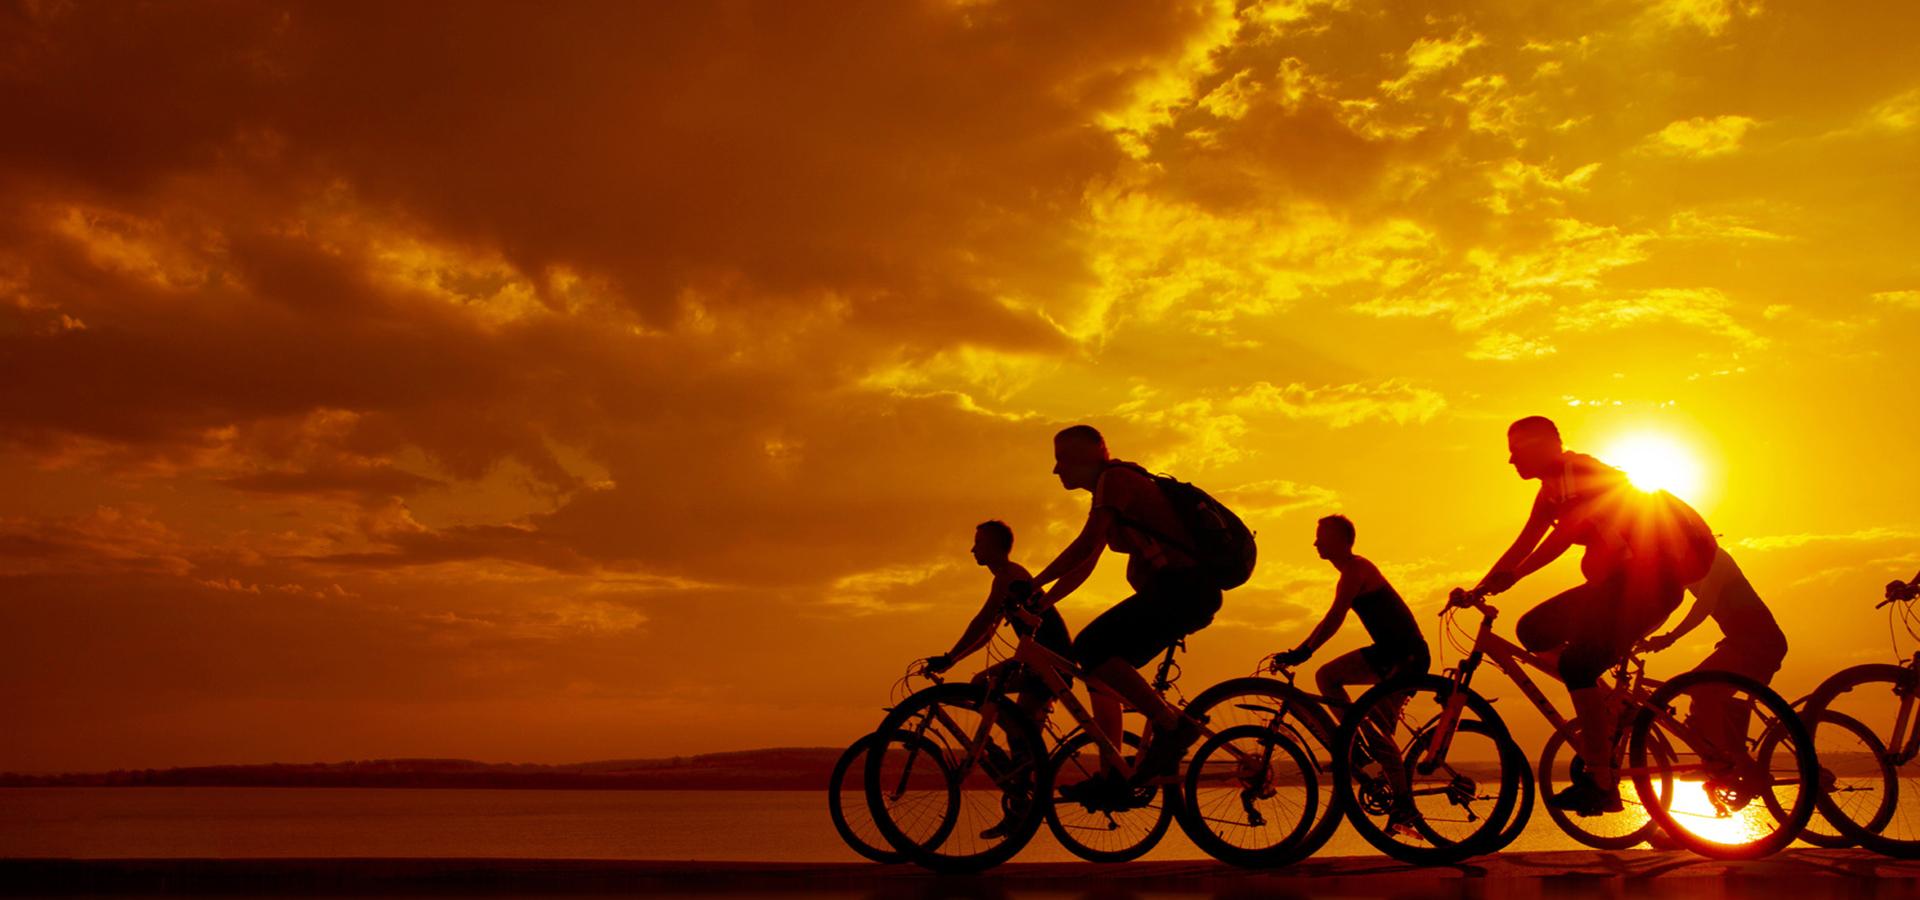 cycliste v u00e9lo v u00e9lo le sport contexte cycle coucher de